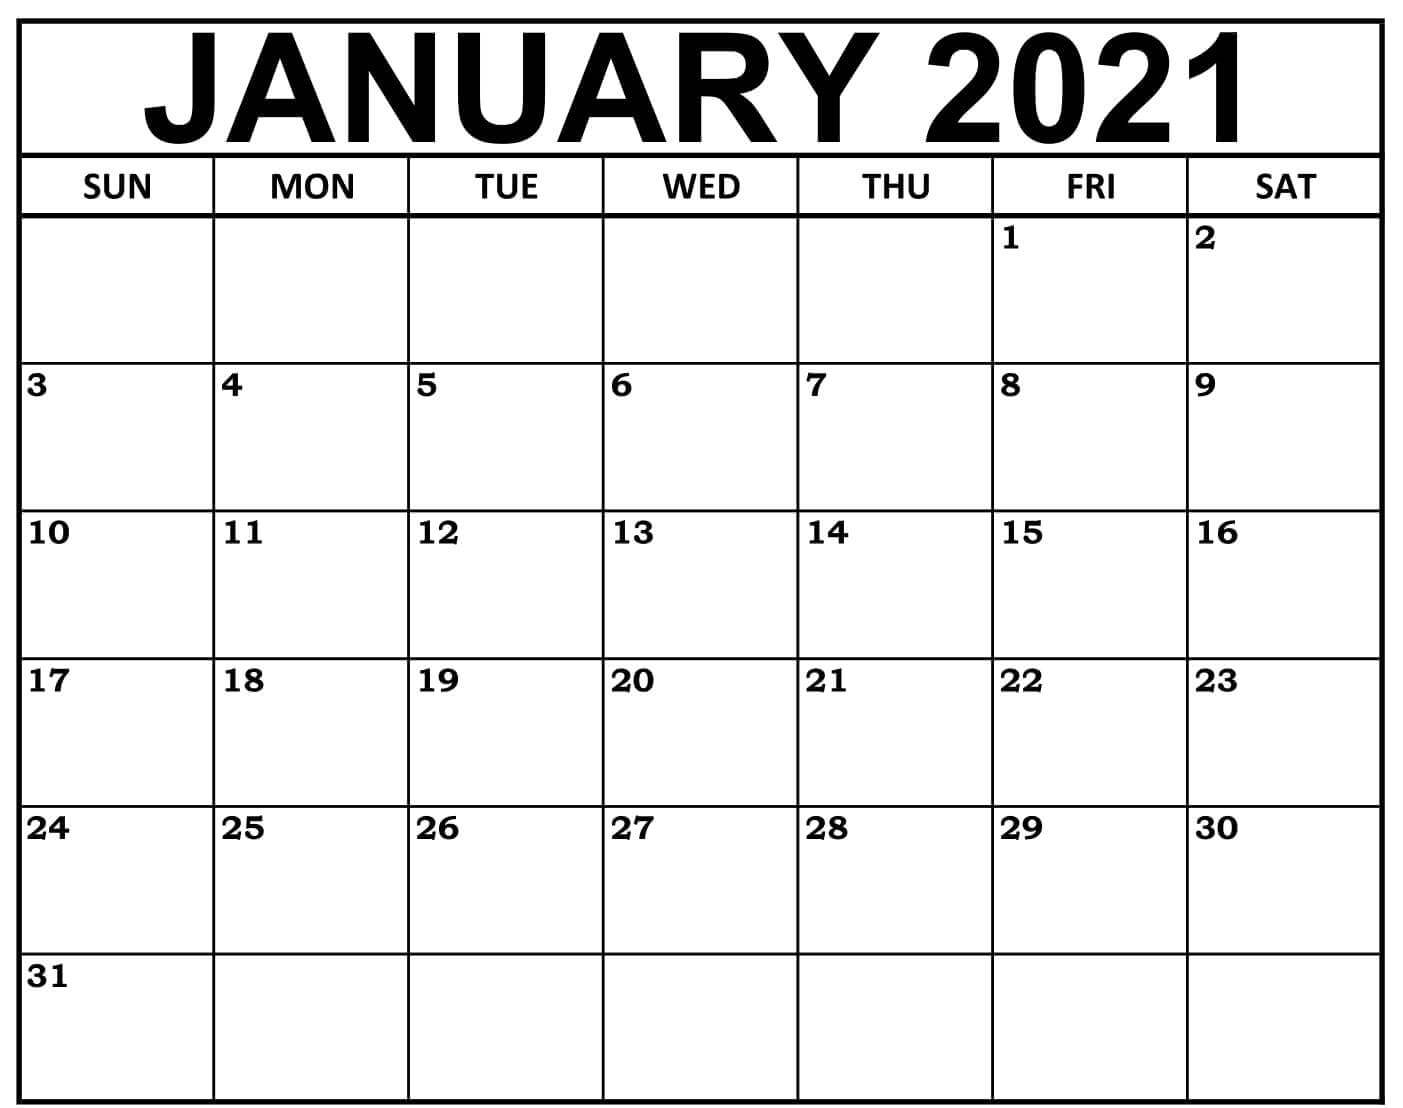 January 2021 PDF Calendar to Print - Free Printable 2021 ...